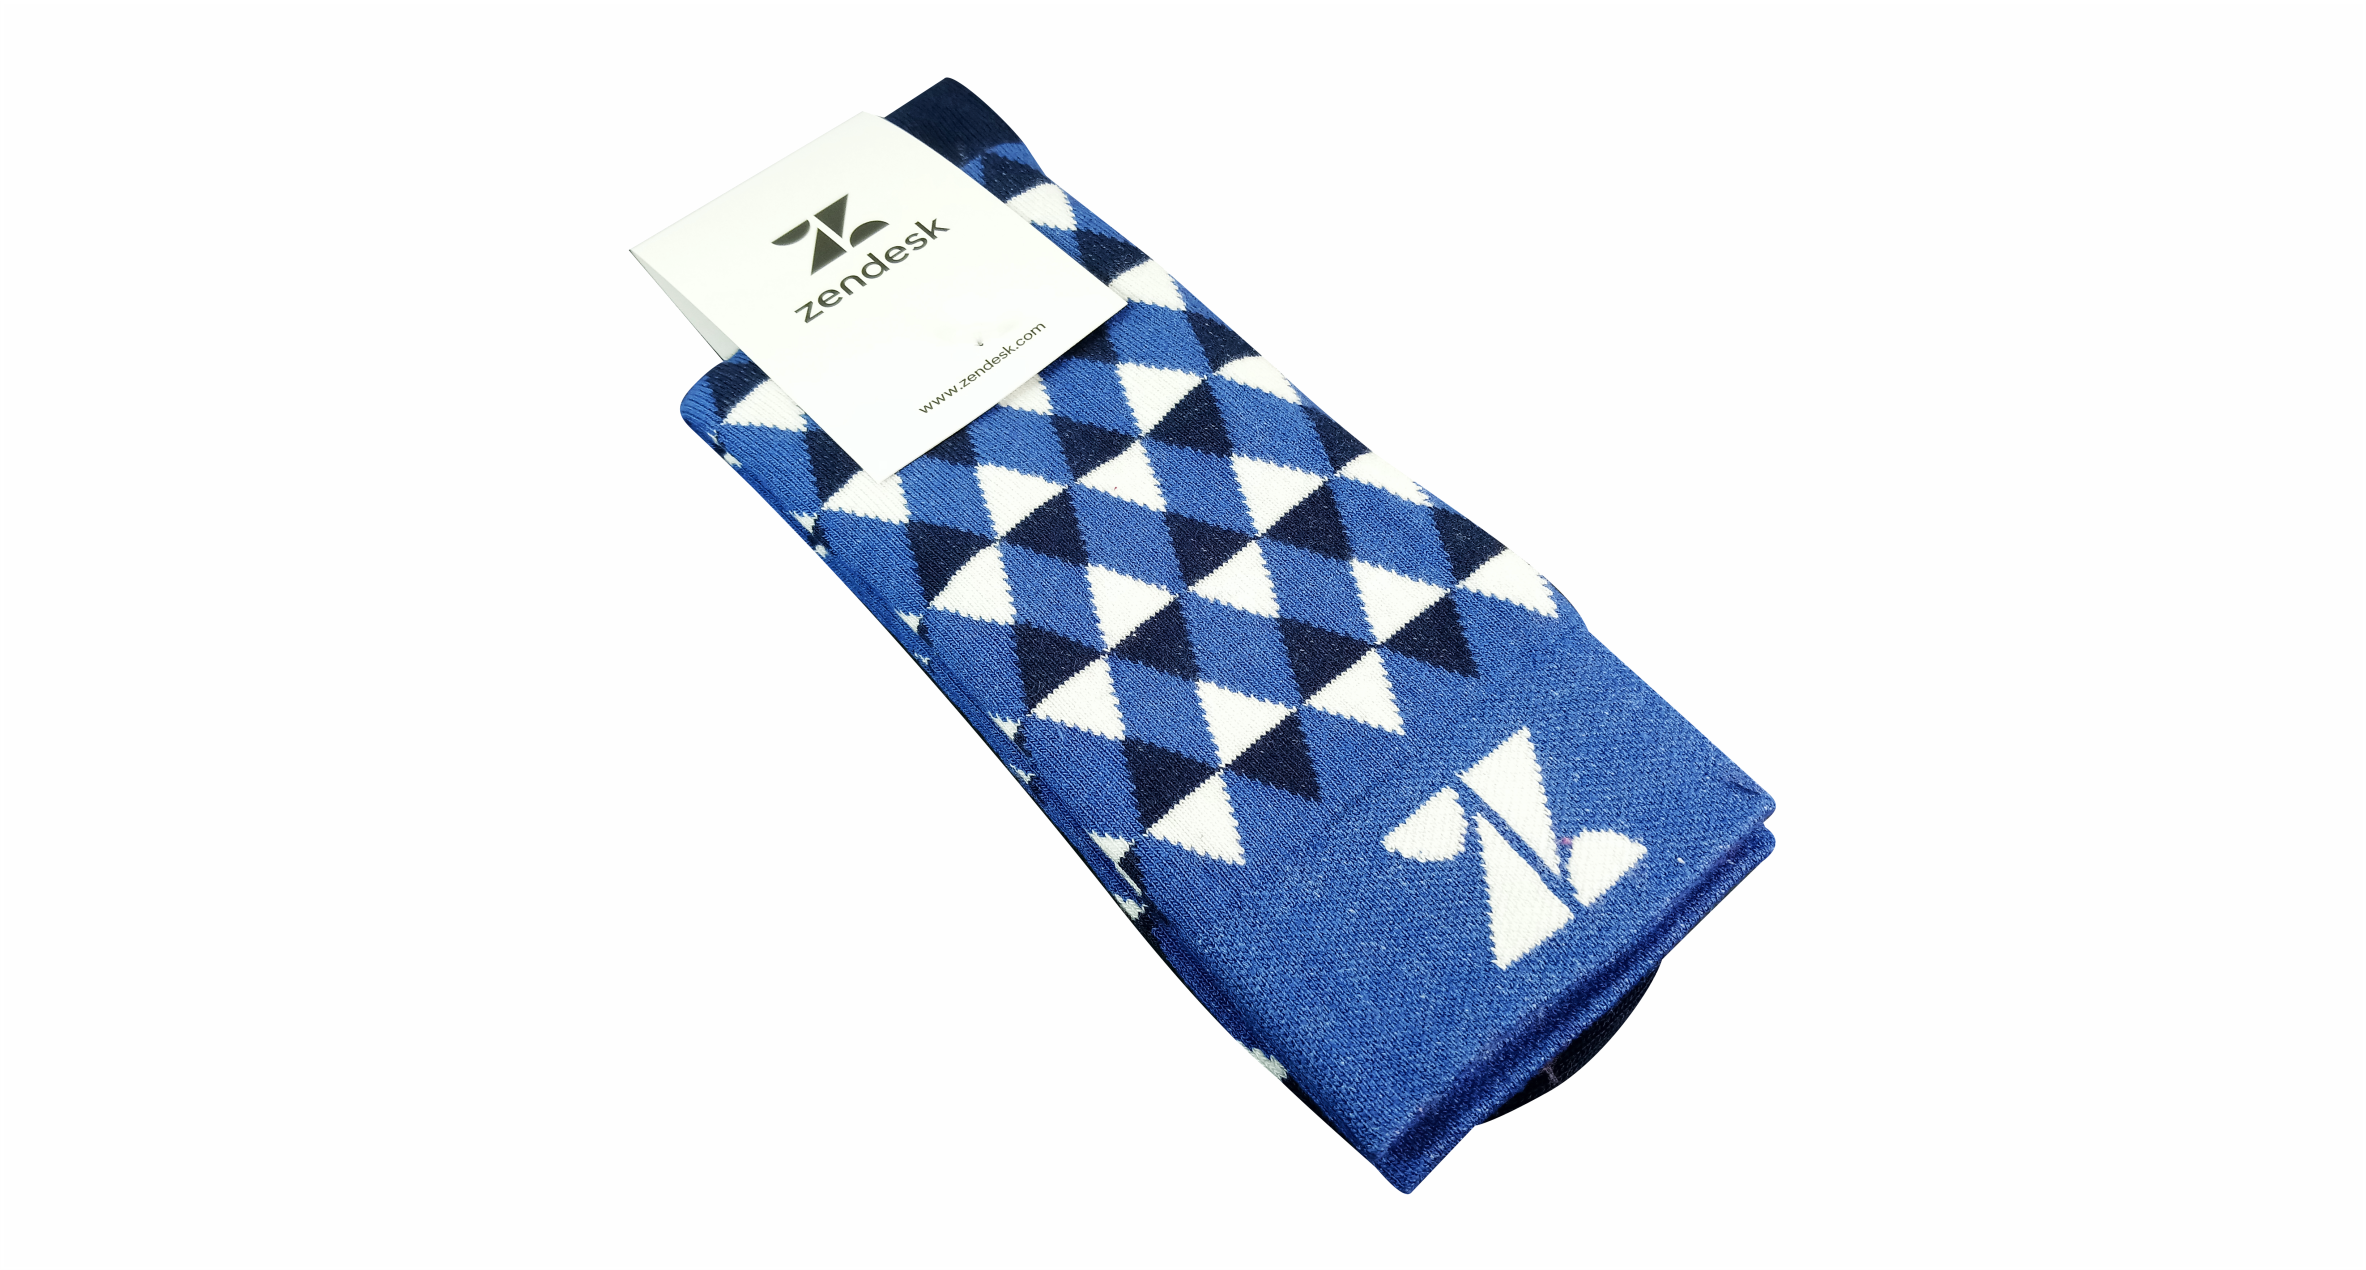 Mid Calf socks 11